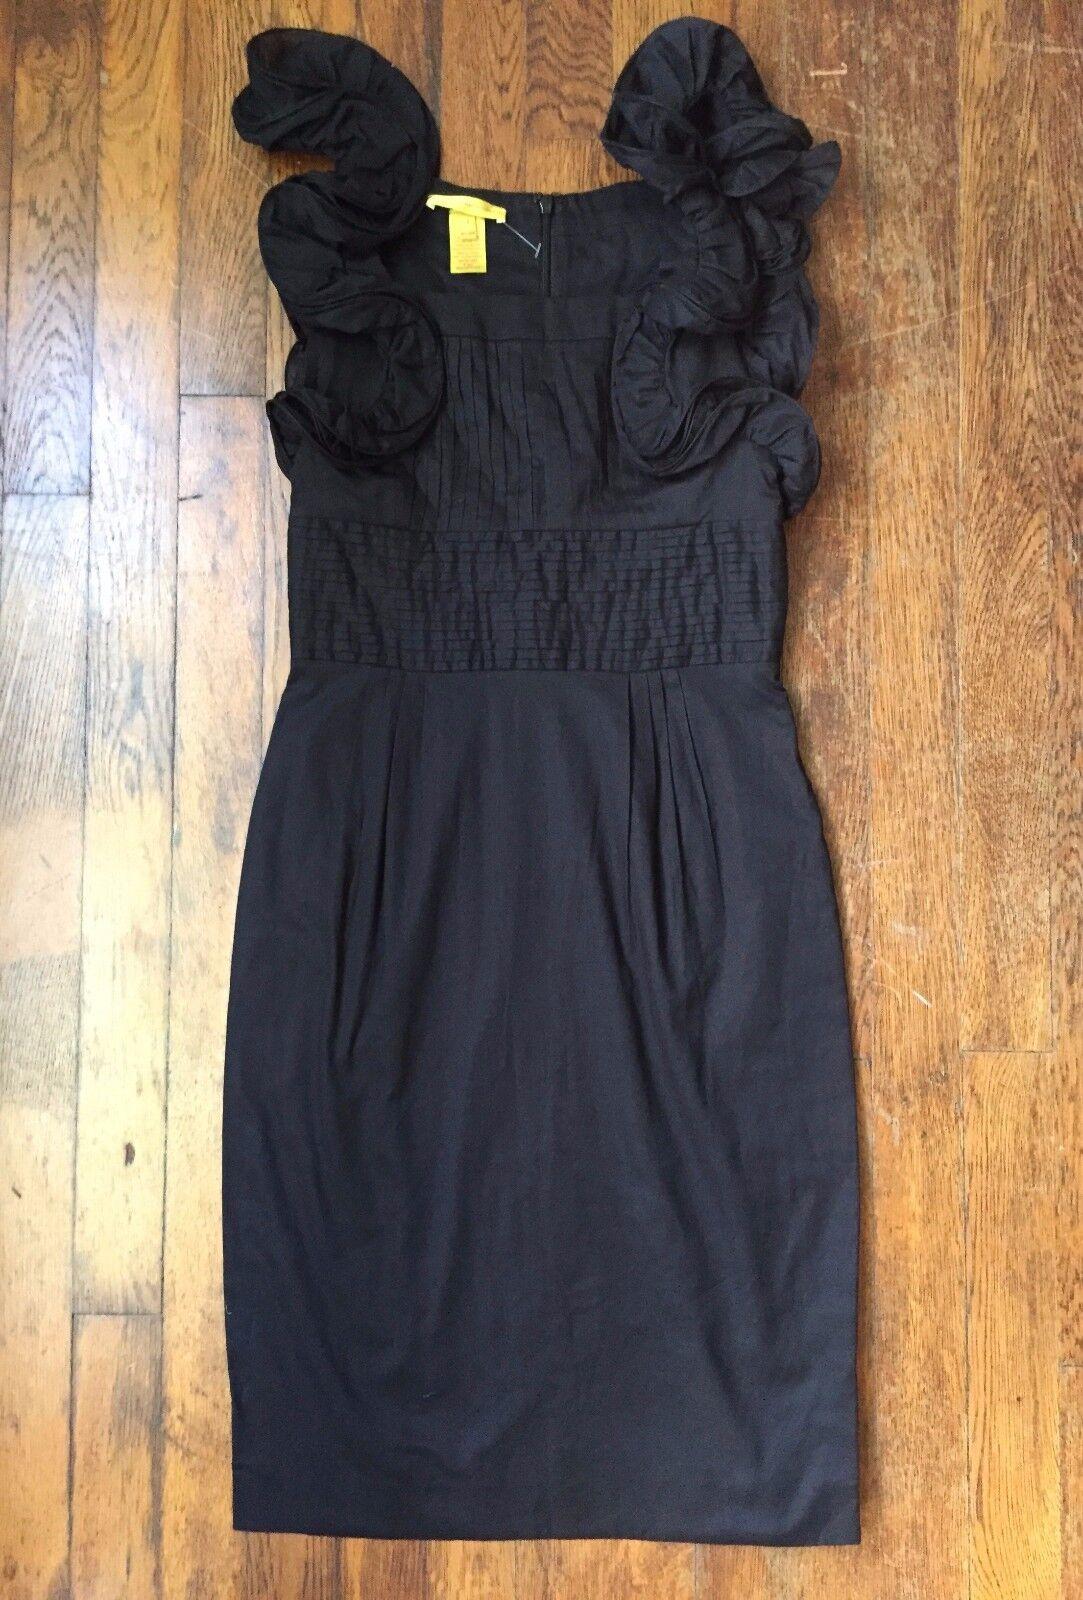 Catherine Malandrino schwarz Ruffled Sleeve Sheath Mini Cocktail Dress Sz 0 RARE